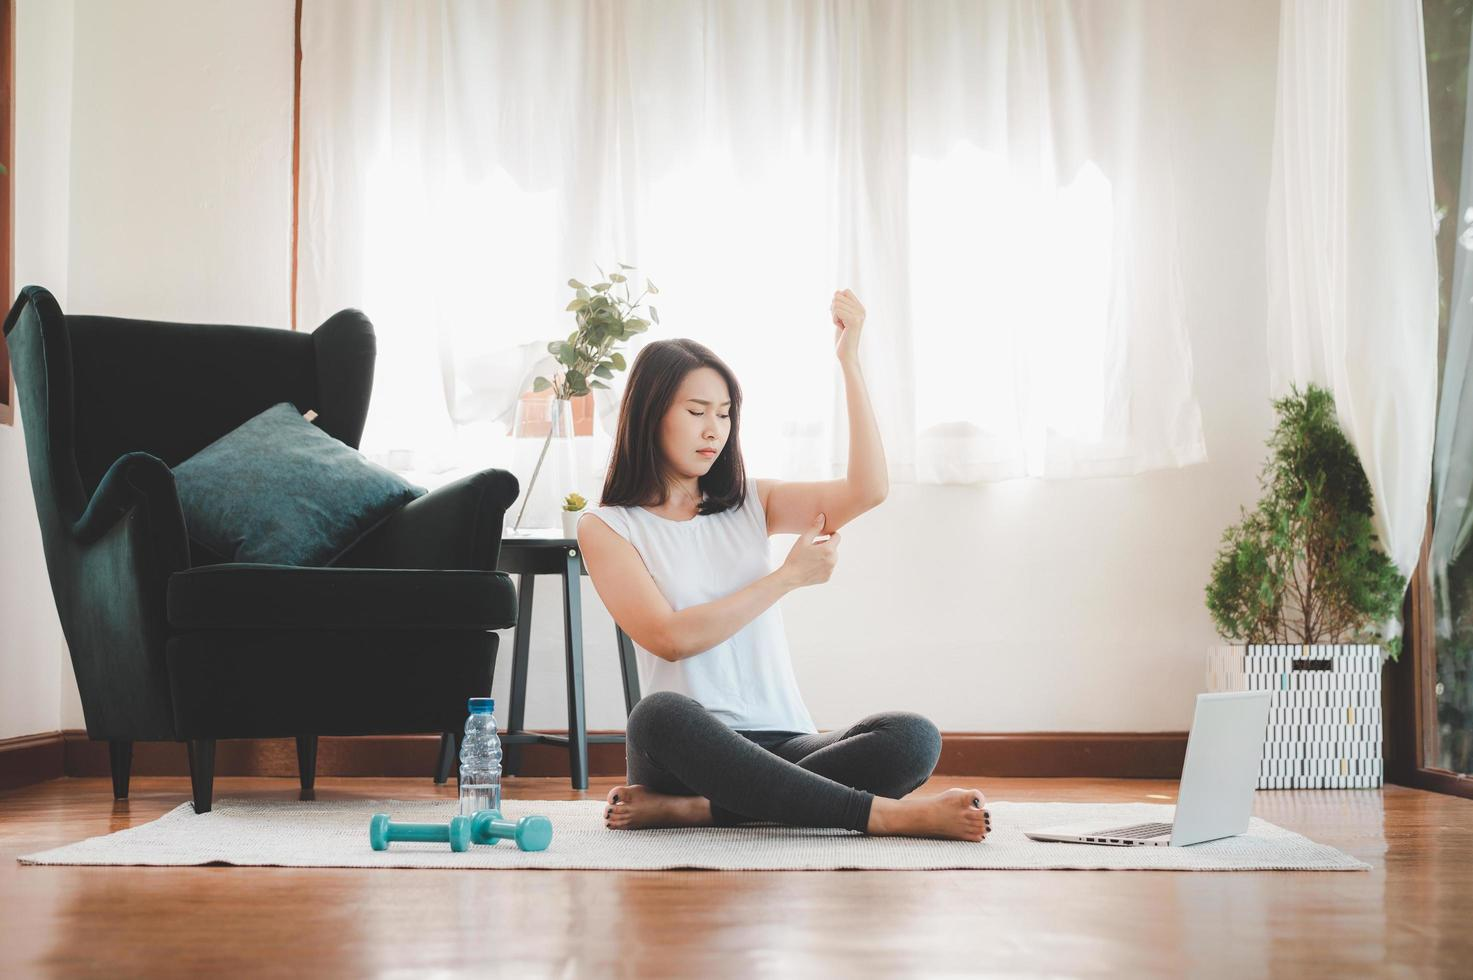 femme, pincement, bras, triceps, graisse photo